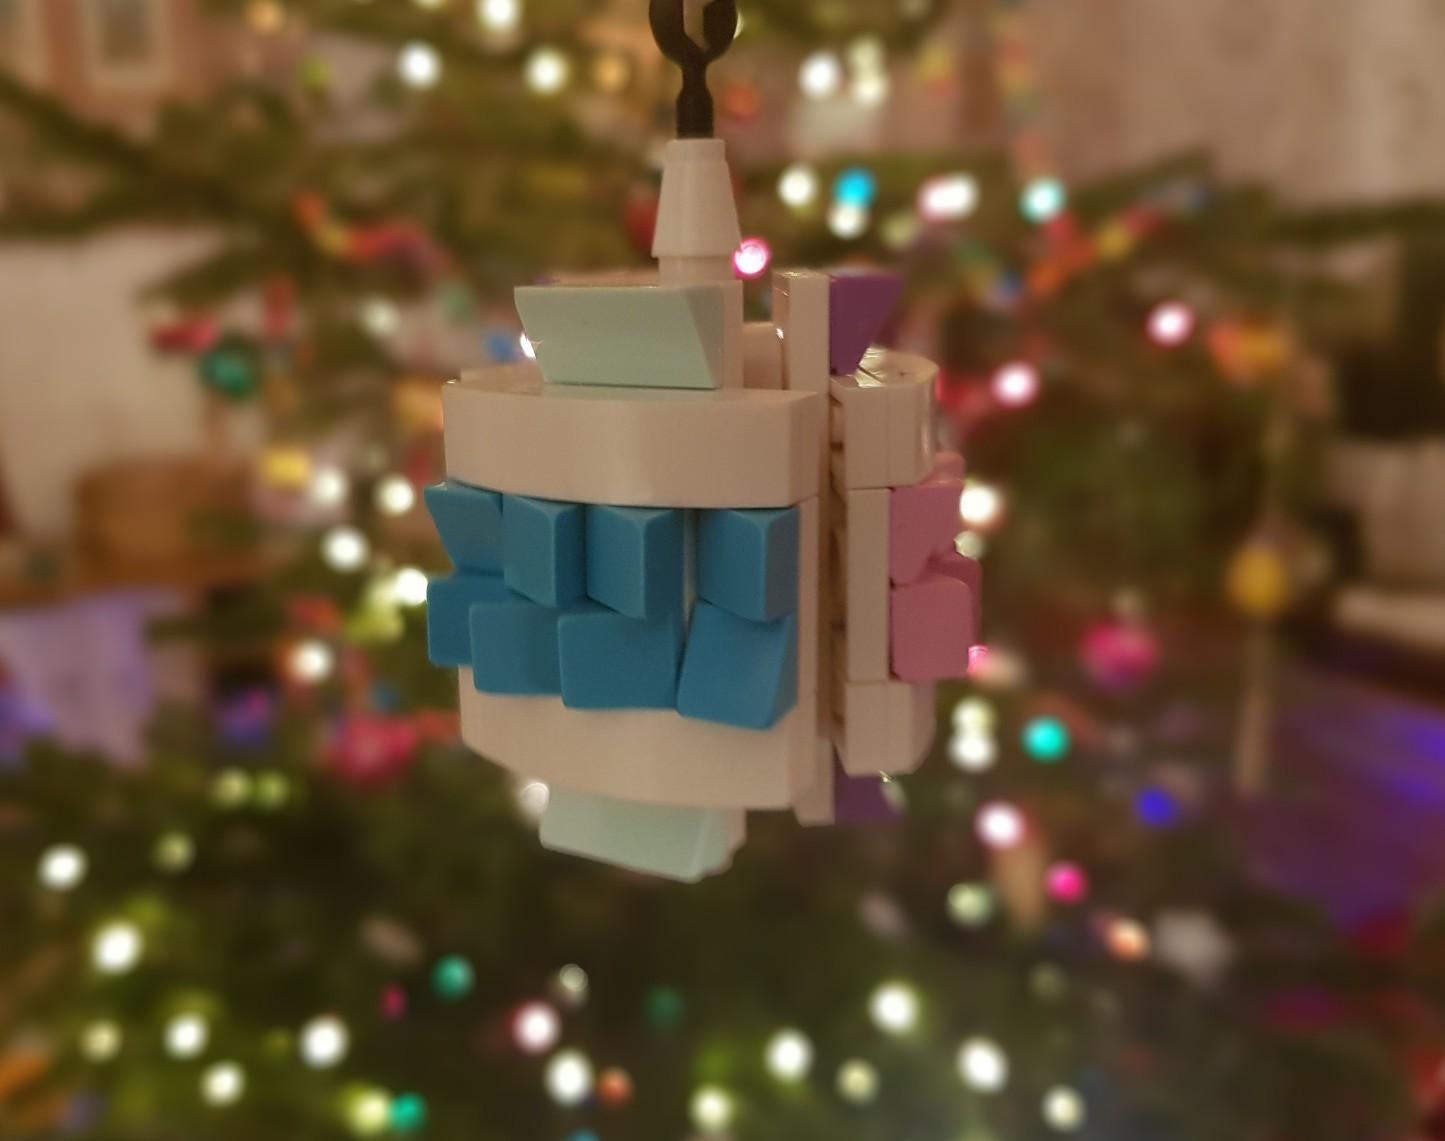 lego moc christmas baubles ornament tri frozen pink magenta